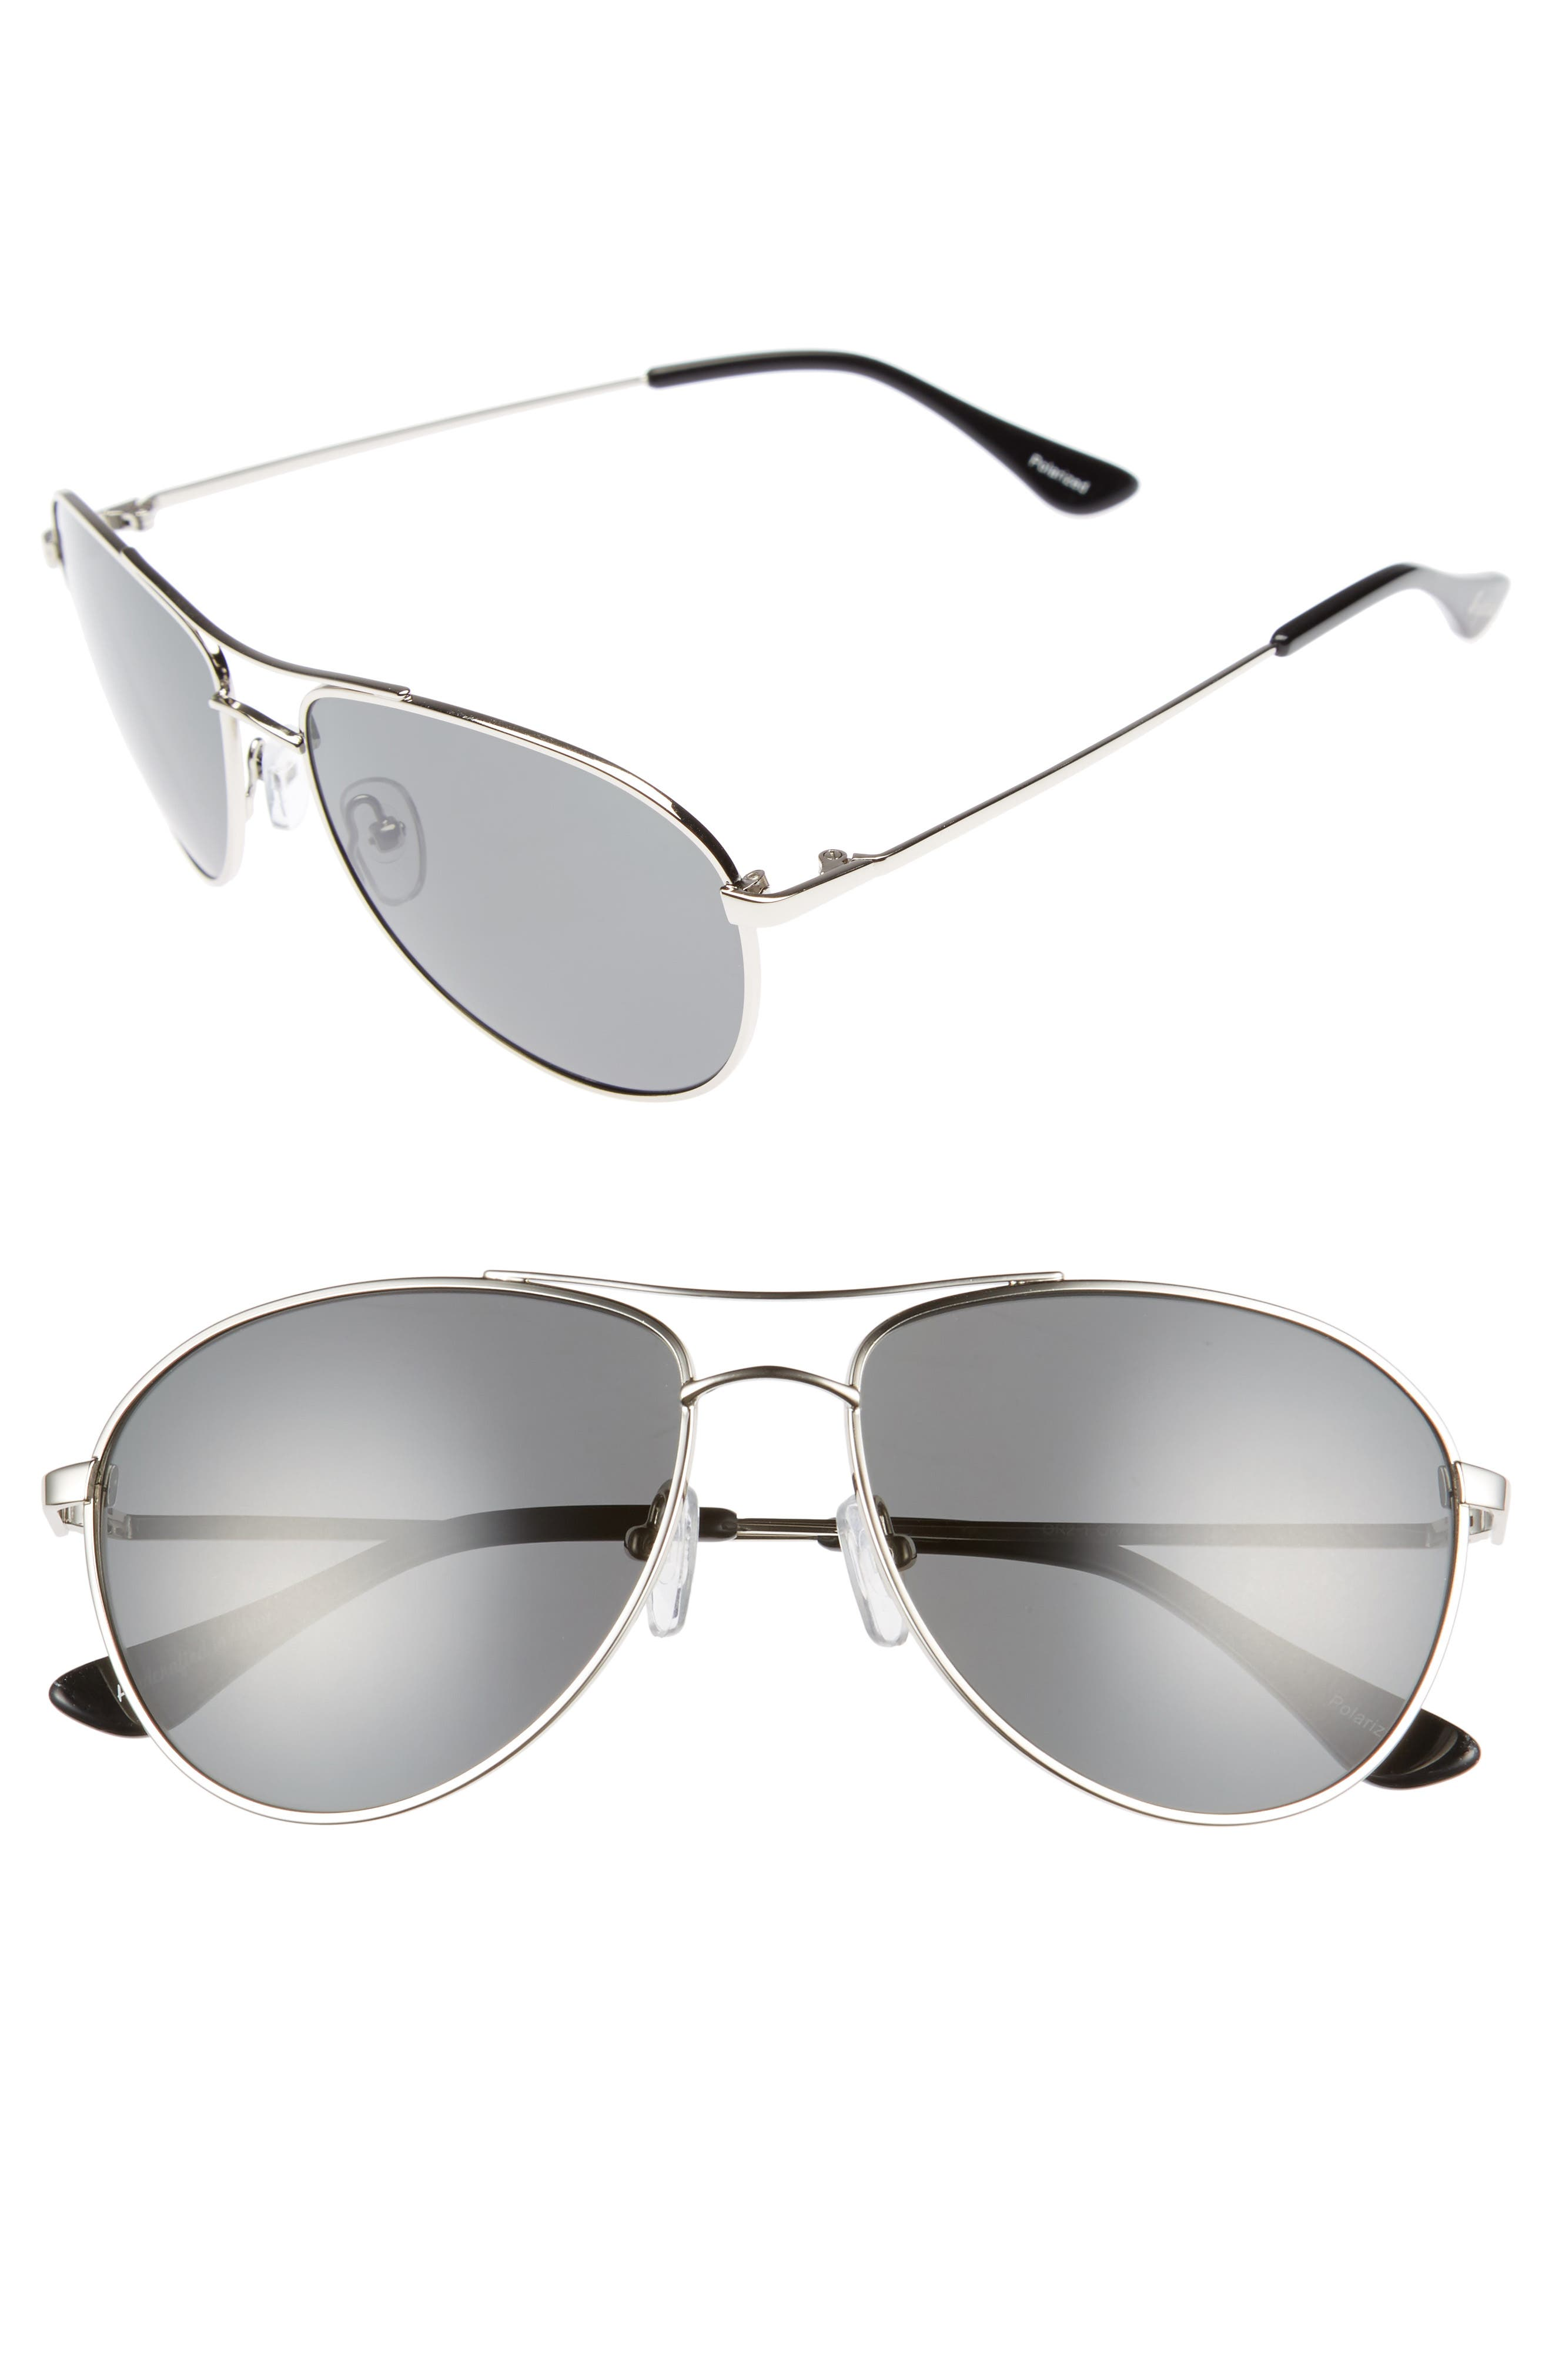 Brightside Orville 58mm Polarized Aviator Sunglasses